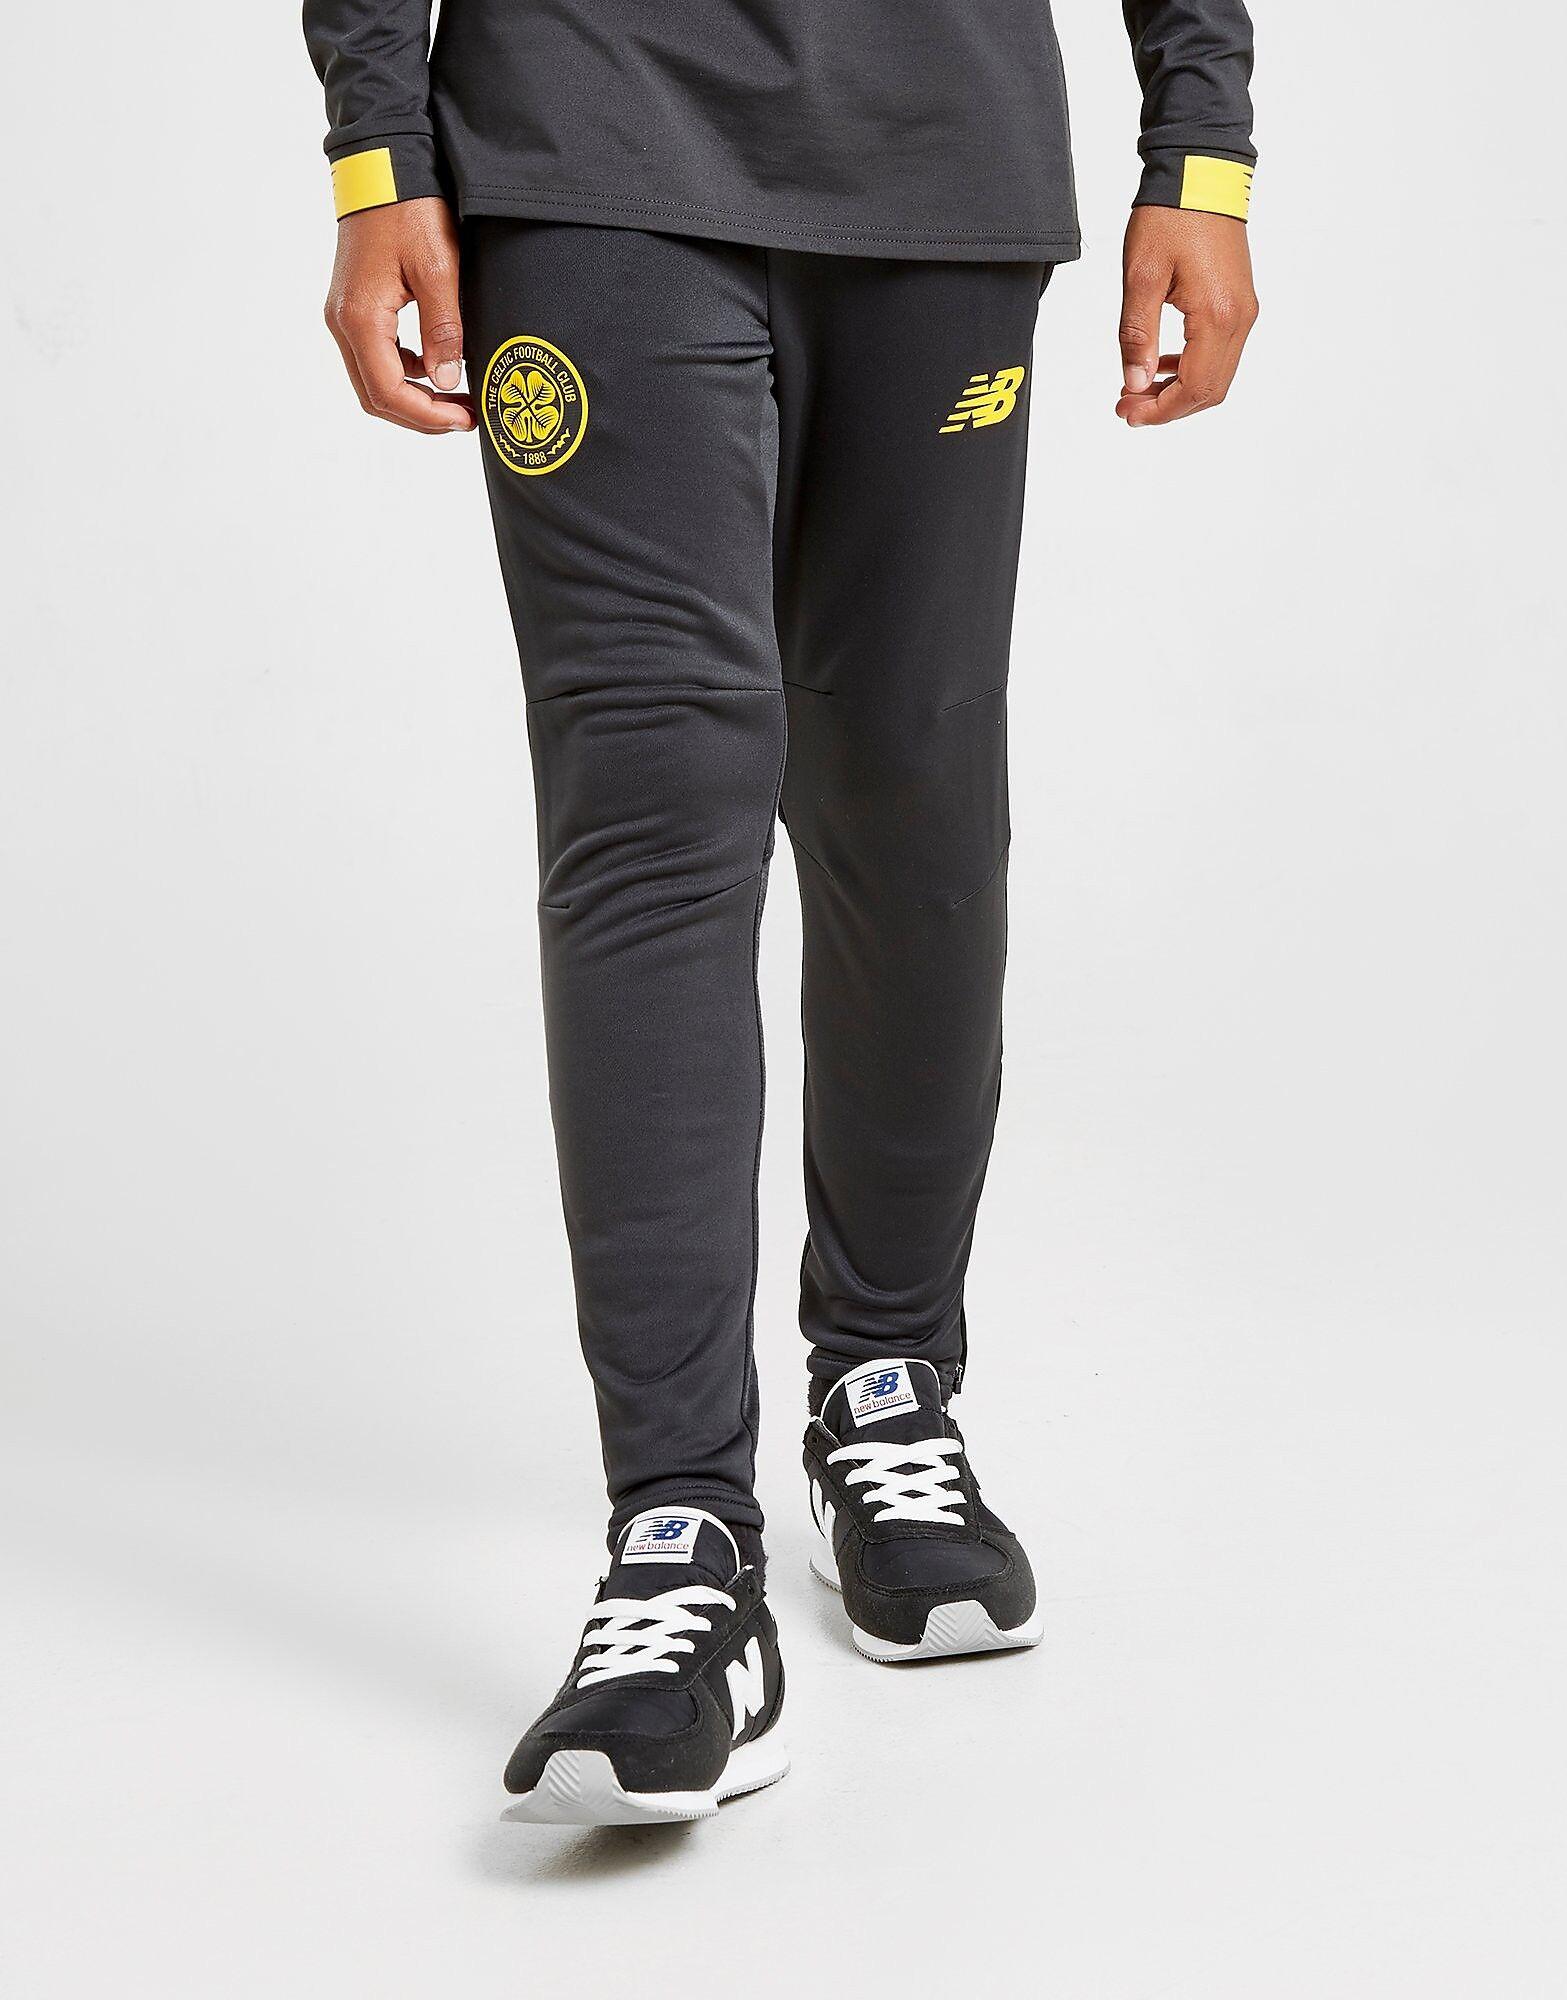 Image of New Balance Celtic FC Slim Track Pants Junior - Kids, Musta